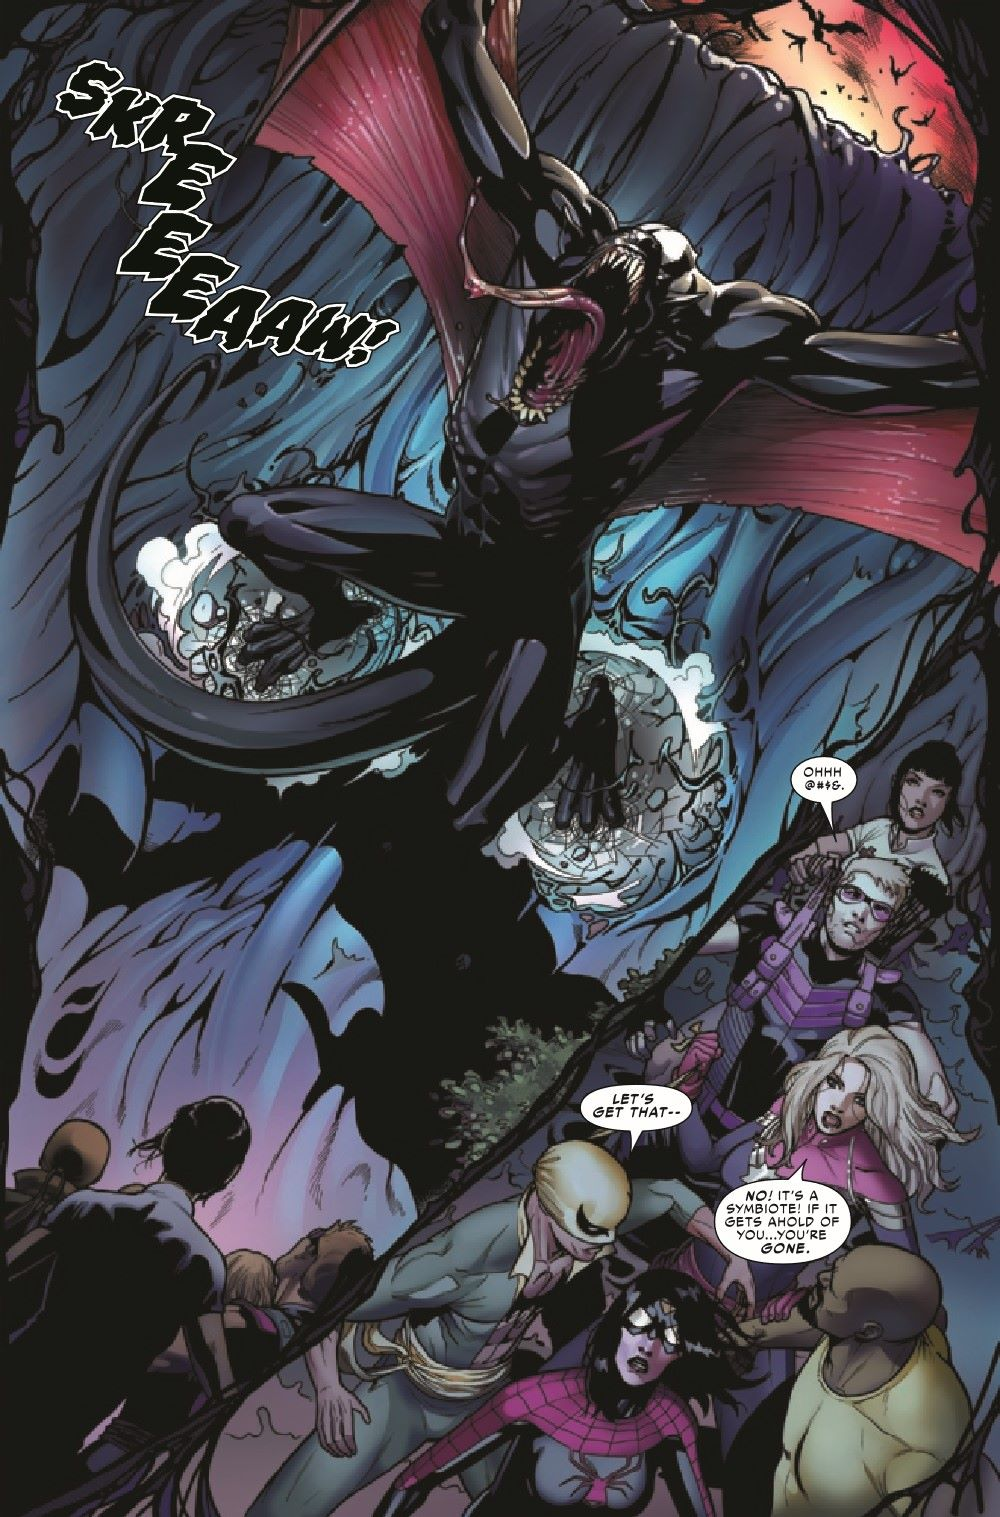 SWOMAN2020007_Preview-6 ComicList Previews: SPIDER-WOMAN #7